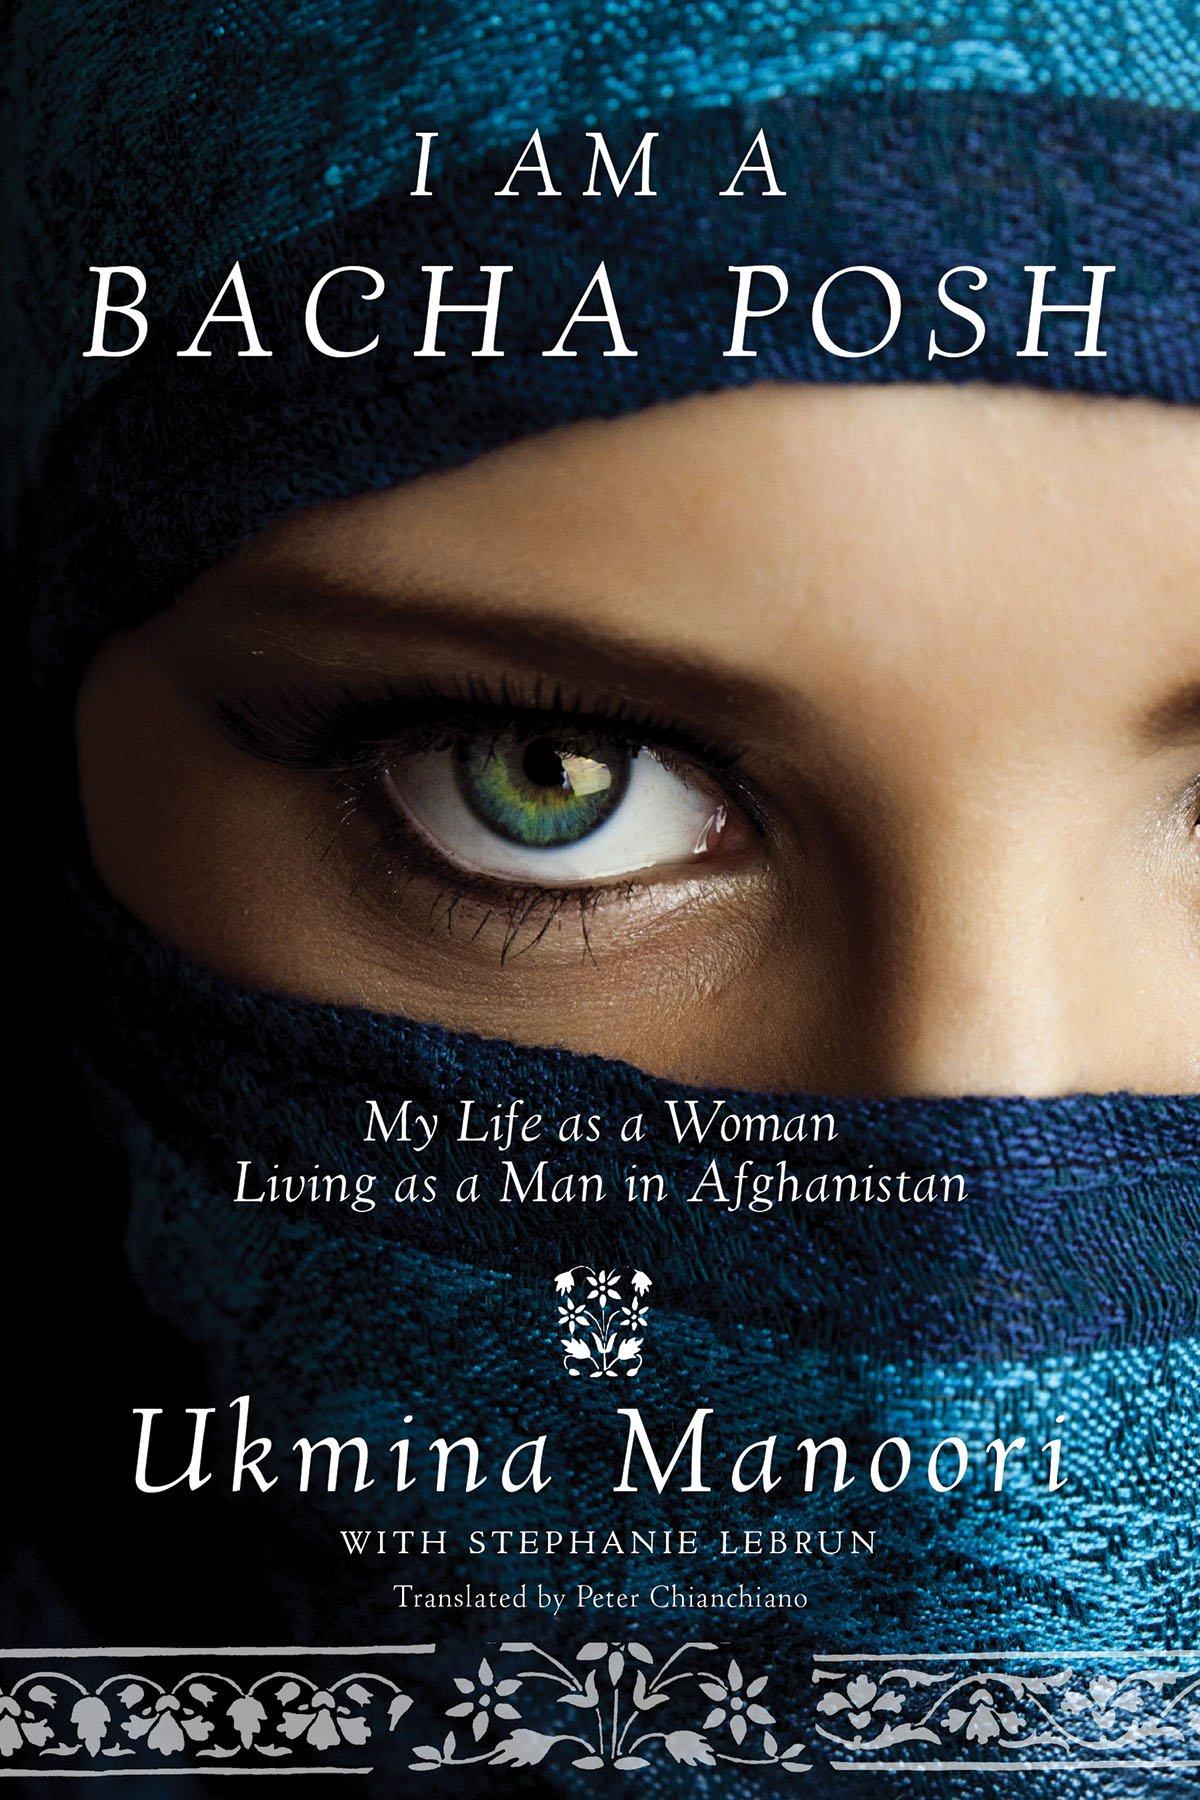 Amazon.com: I Am a Bacha Posh: My Life as a Woman Living as a Man in  Afghanistan (9781629146812): Ukmina Manoori, Peter E Chianchiano Jr. Jr.,  ...